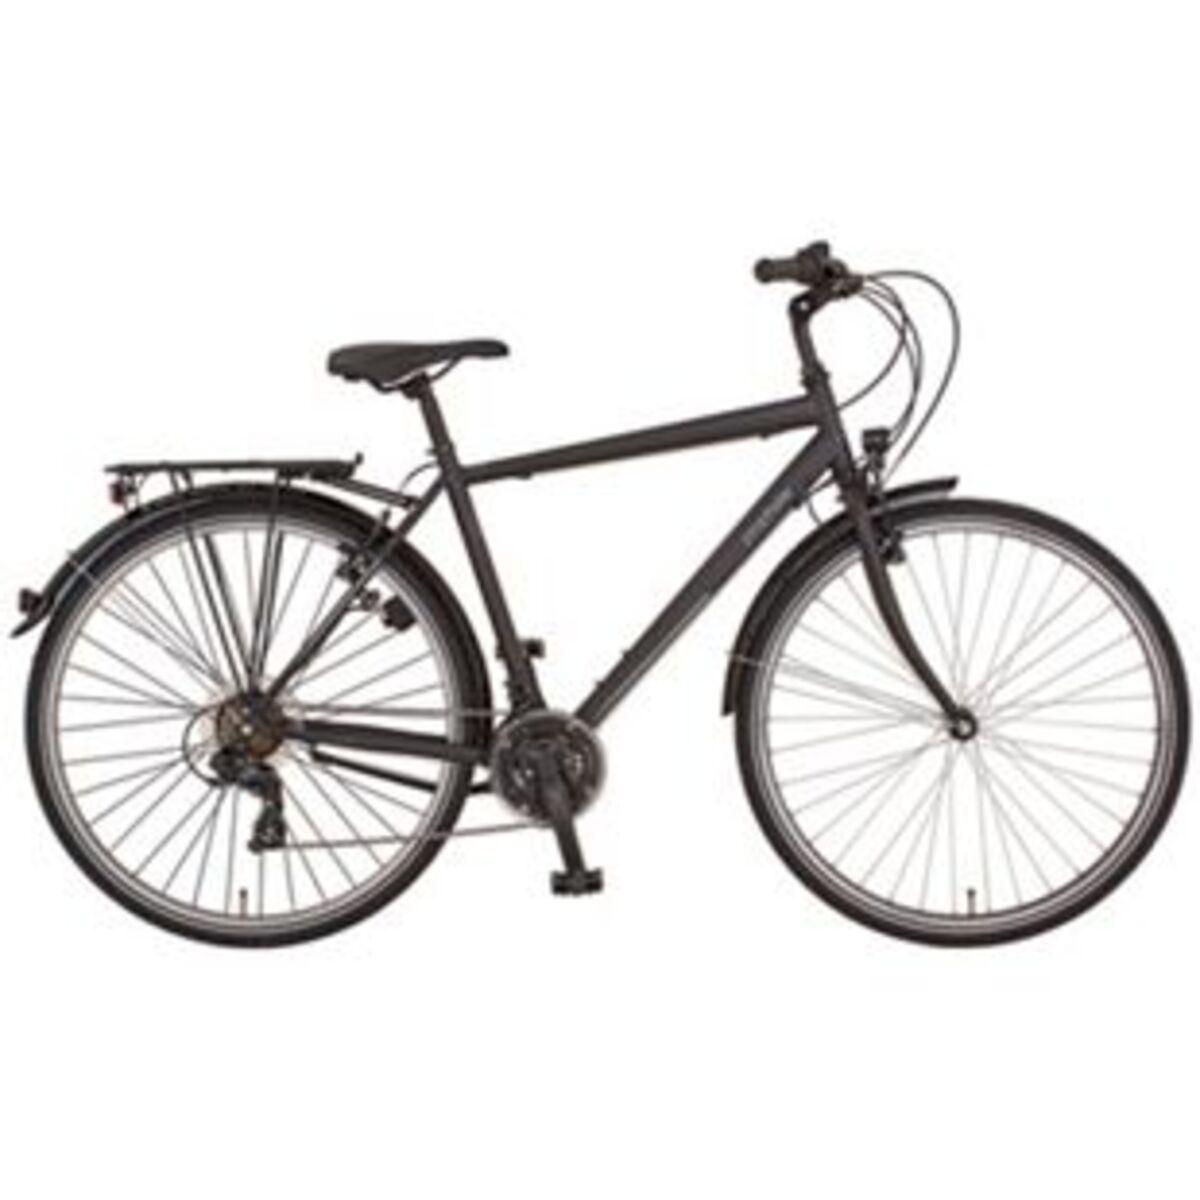 "Bild 2 von PROPHETE ENTDECKER 20.BST.10 28"" Herren Trekking Bike"